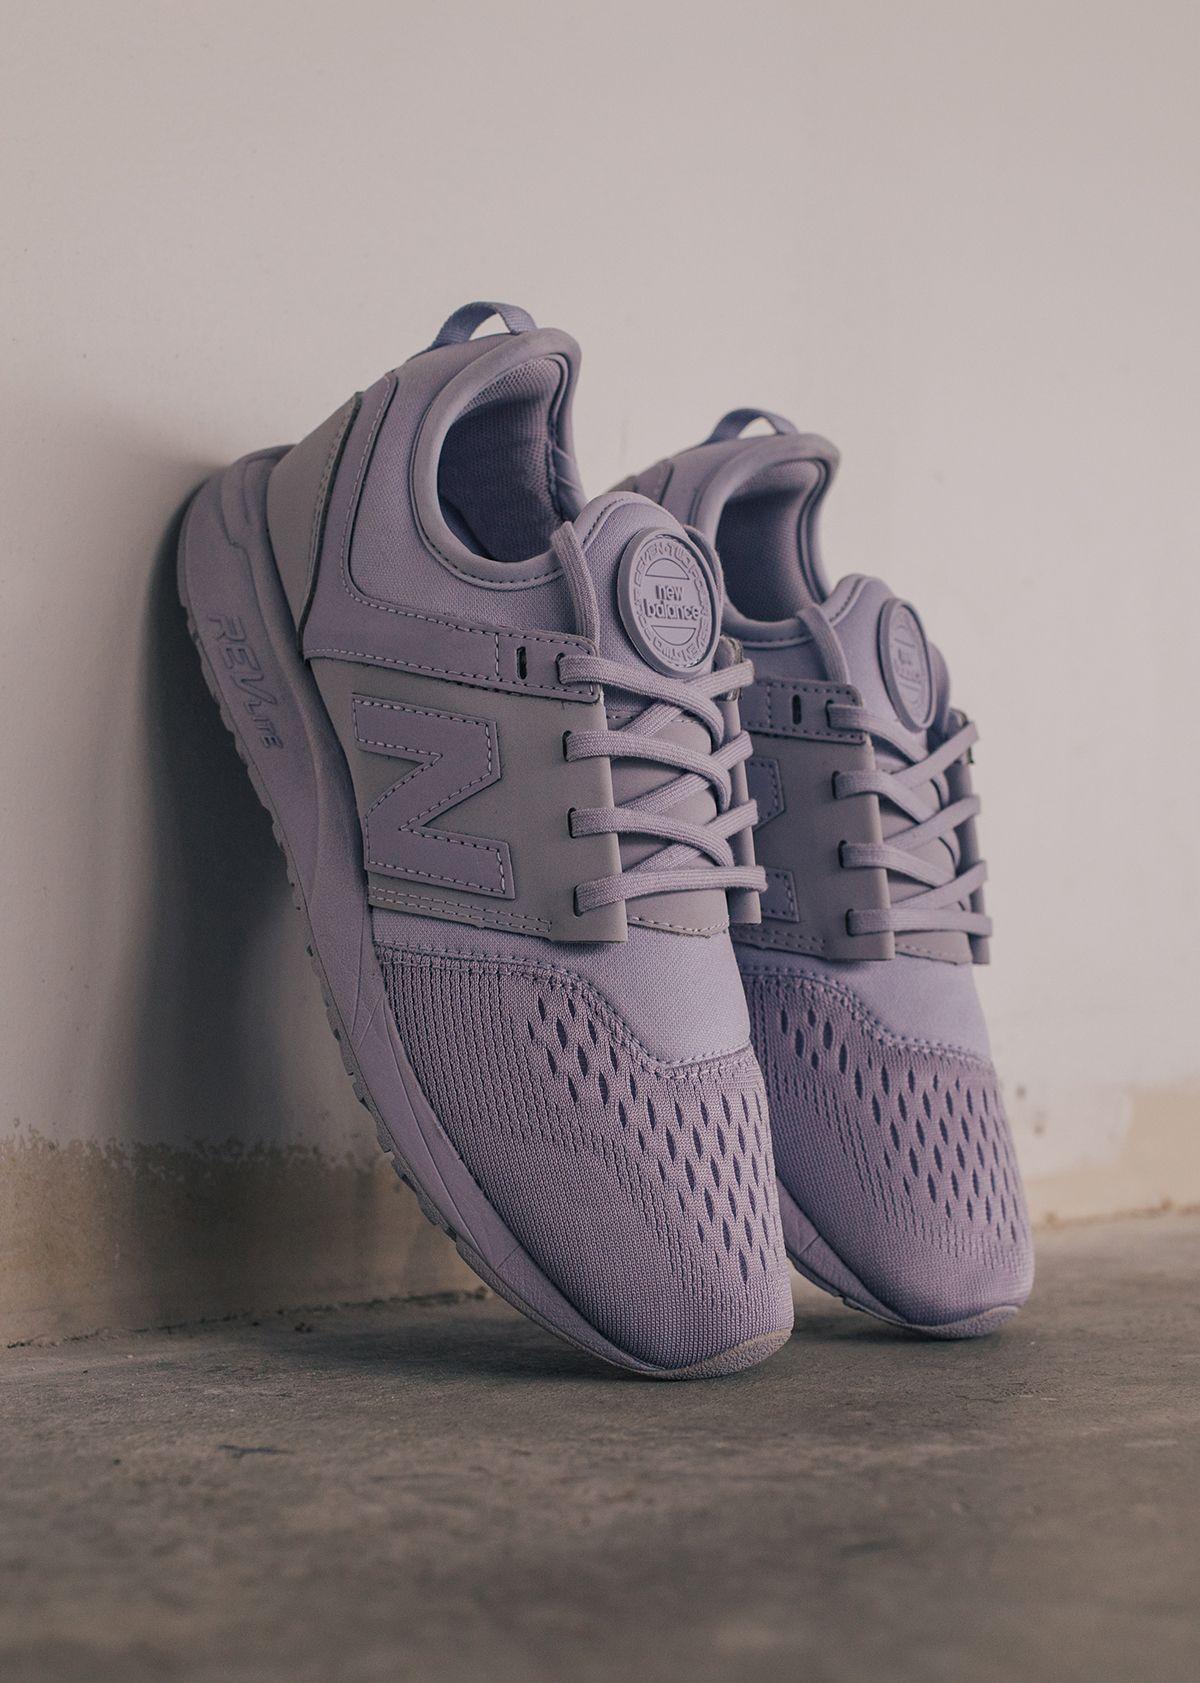 New Balance 247 Breathe Pack Summer 2017 Lookbook | sneakers